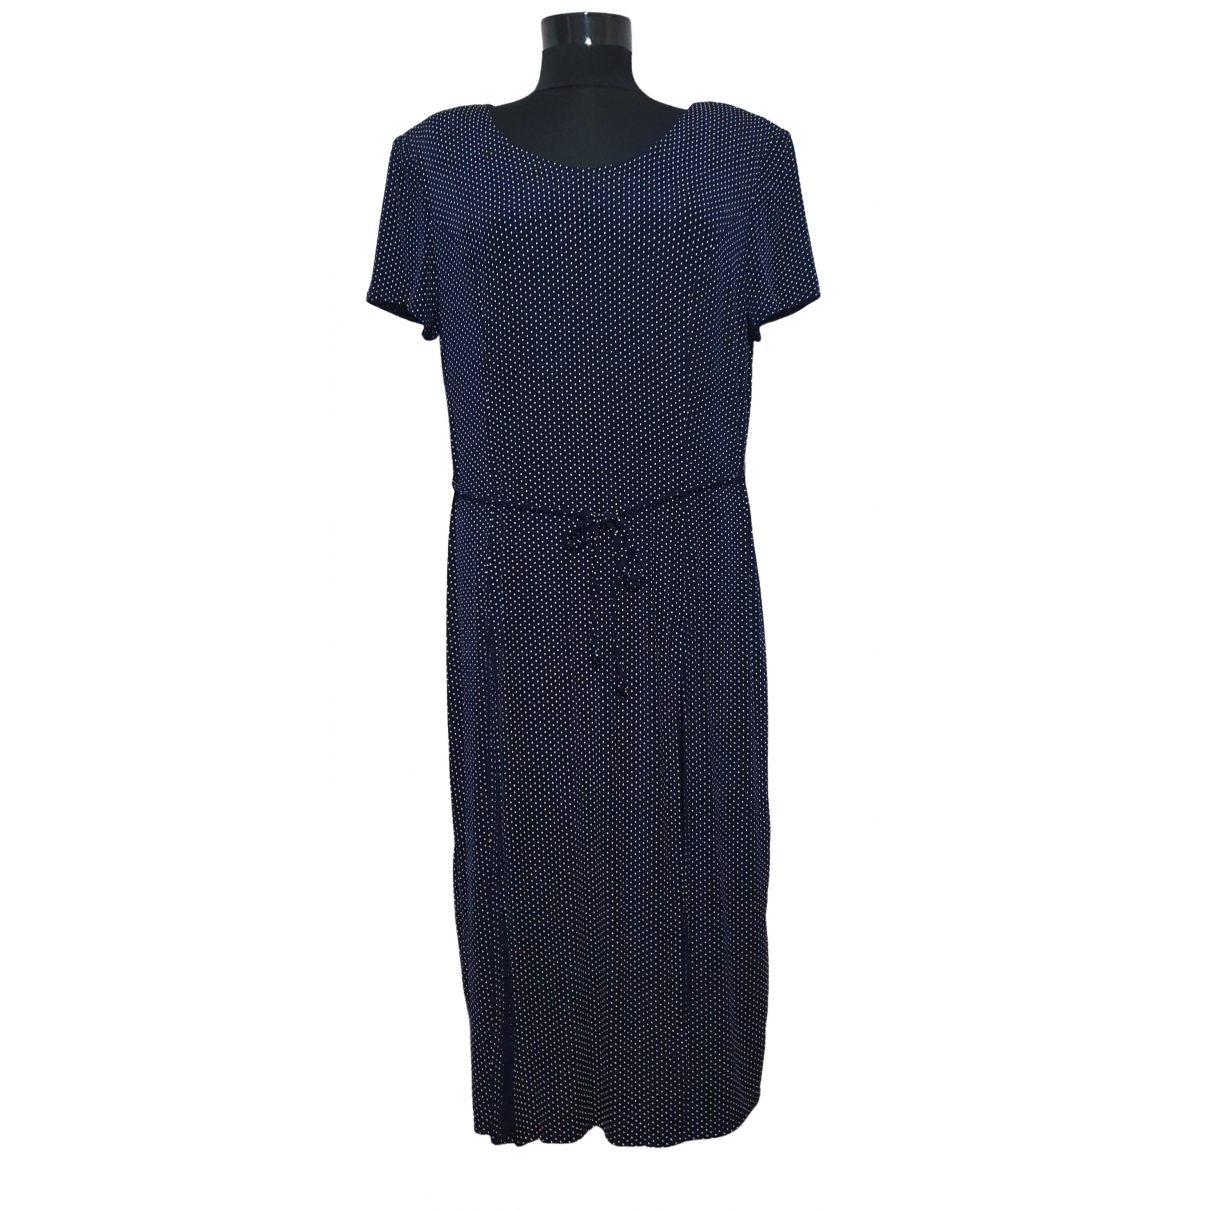 Joseph Ribkoff \N Kleid in  Blau Polyester